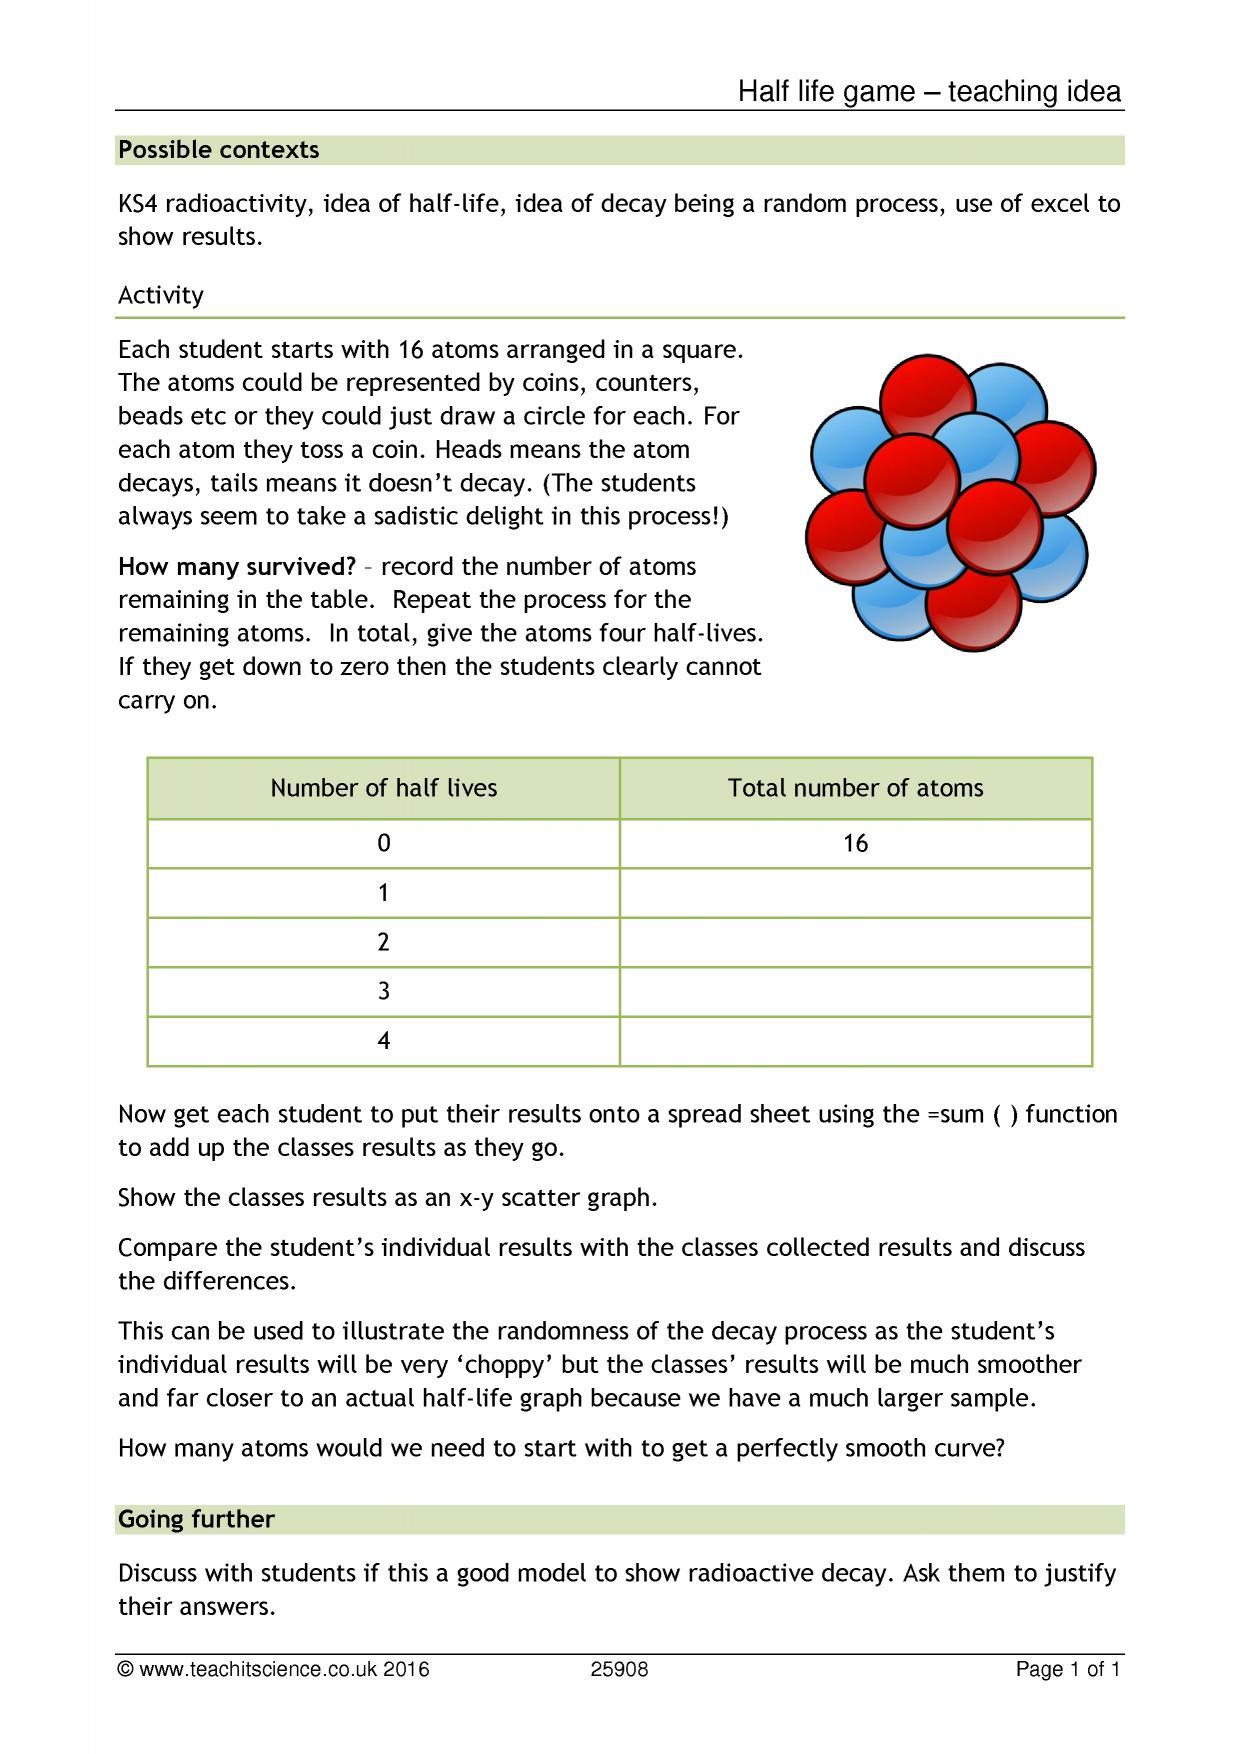 Half life game - teaching idea